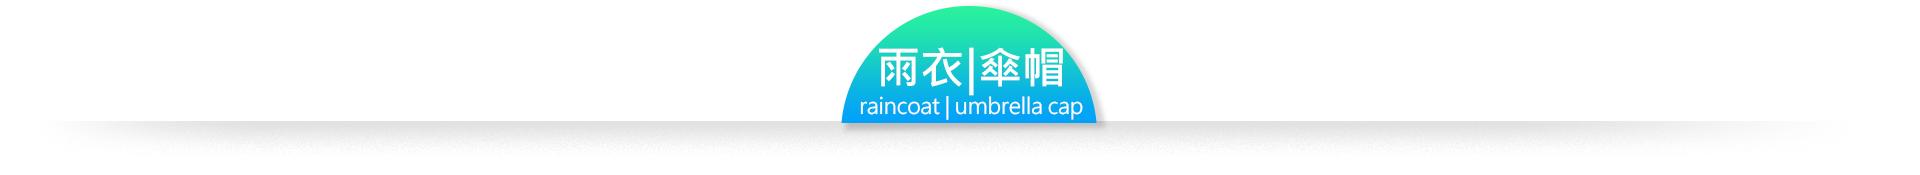 現貨|雨衣|傘帽